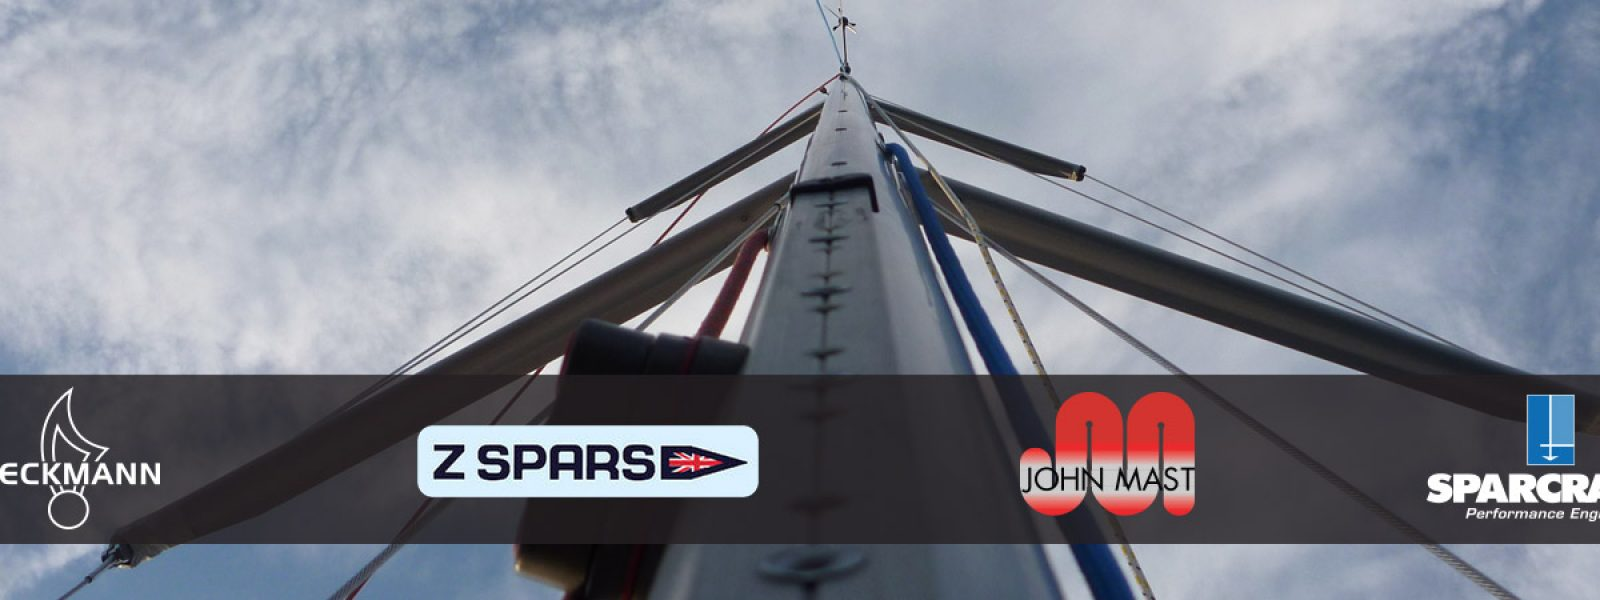 New masts